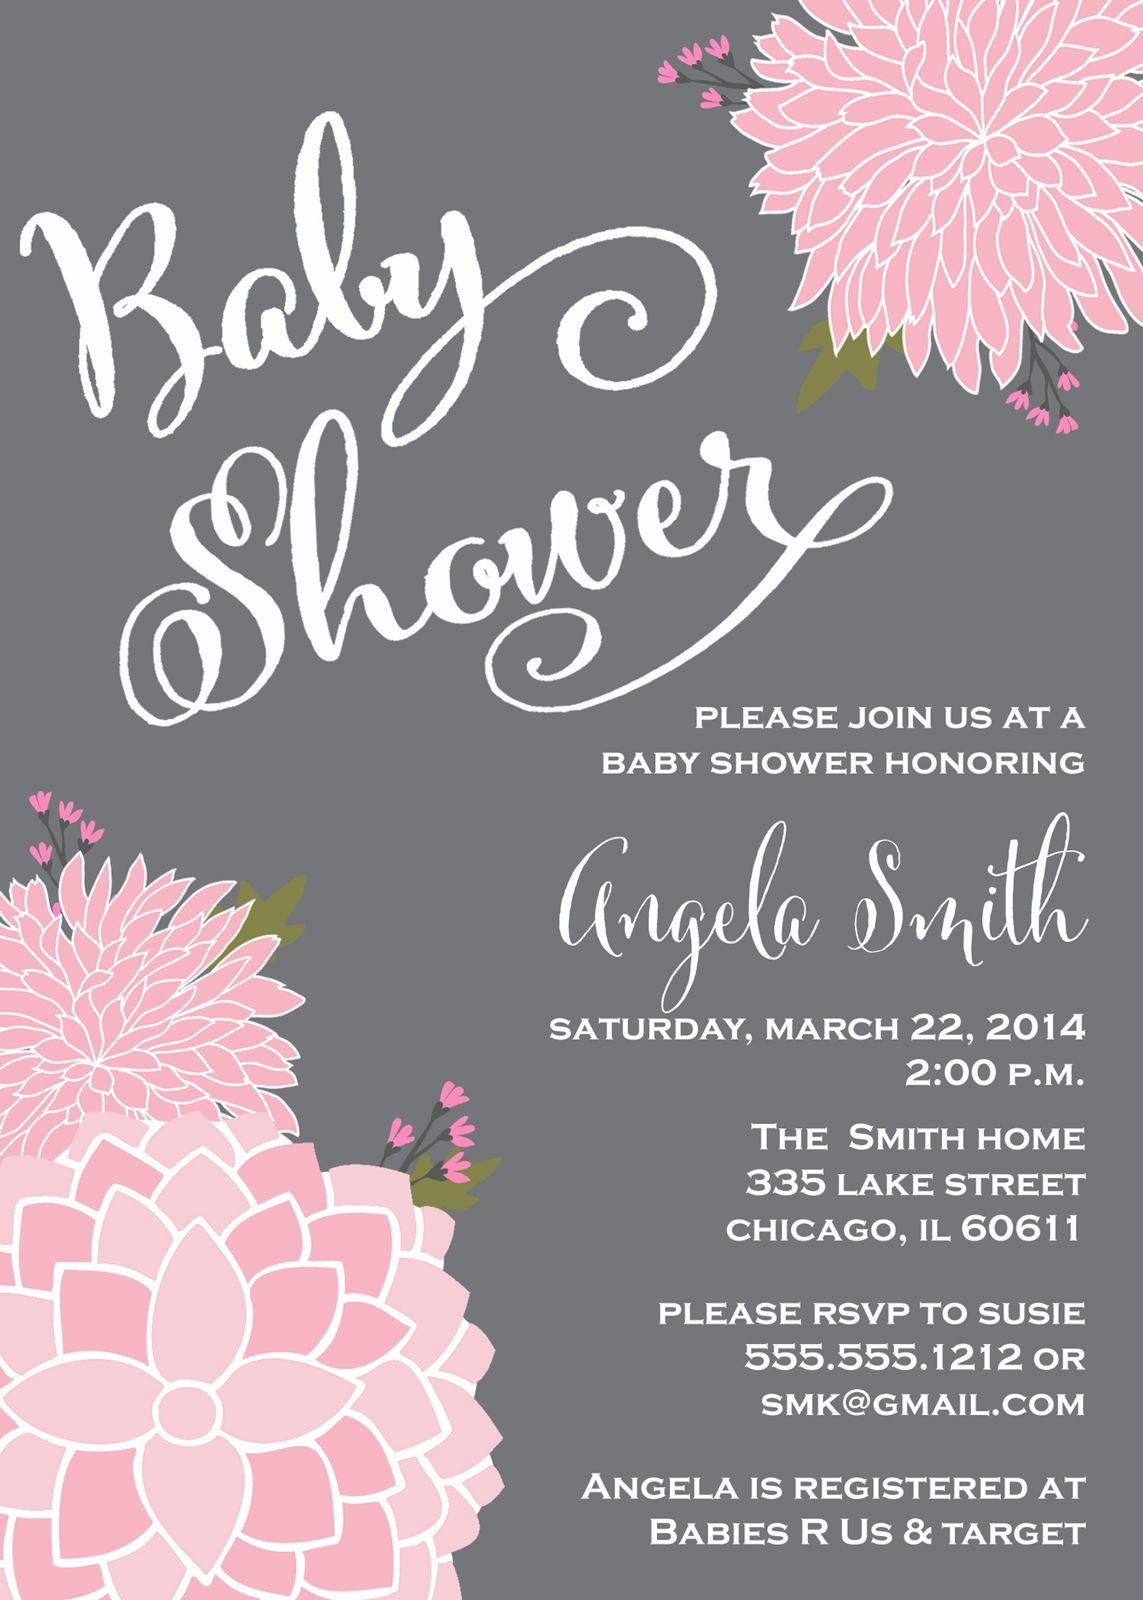 girl baby shower invitation, gray chalkboard, pink, flowers, Baby shower invitations